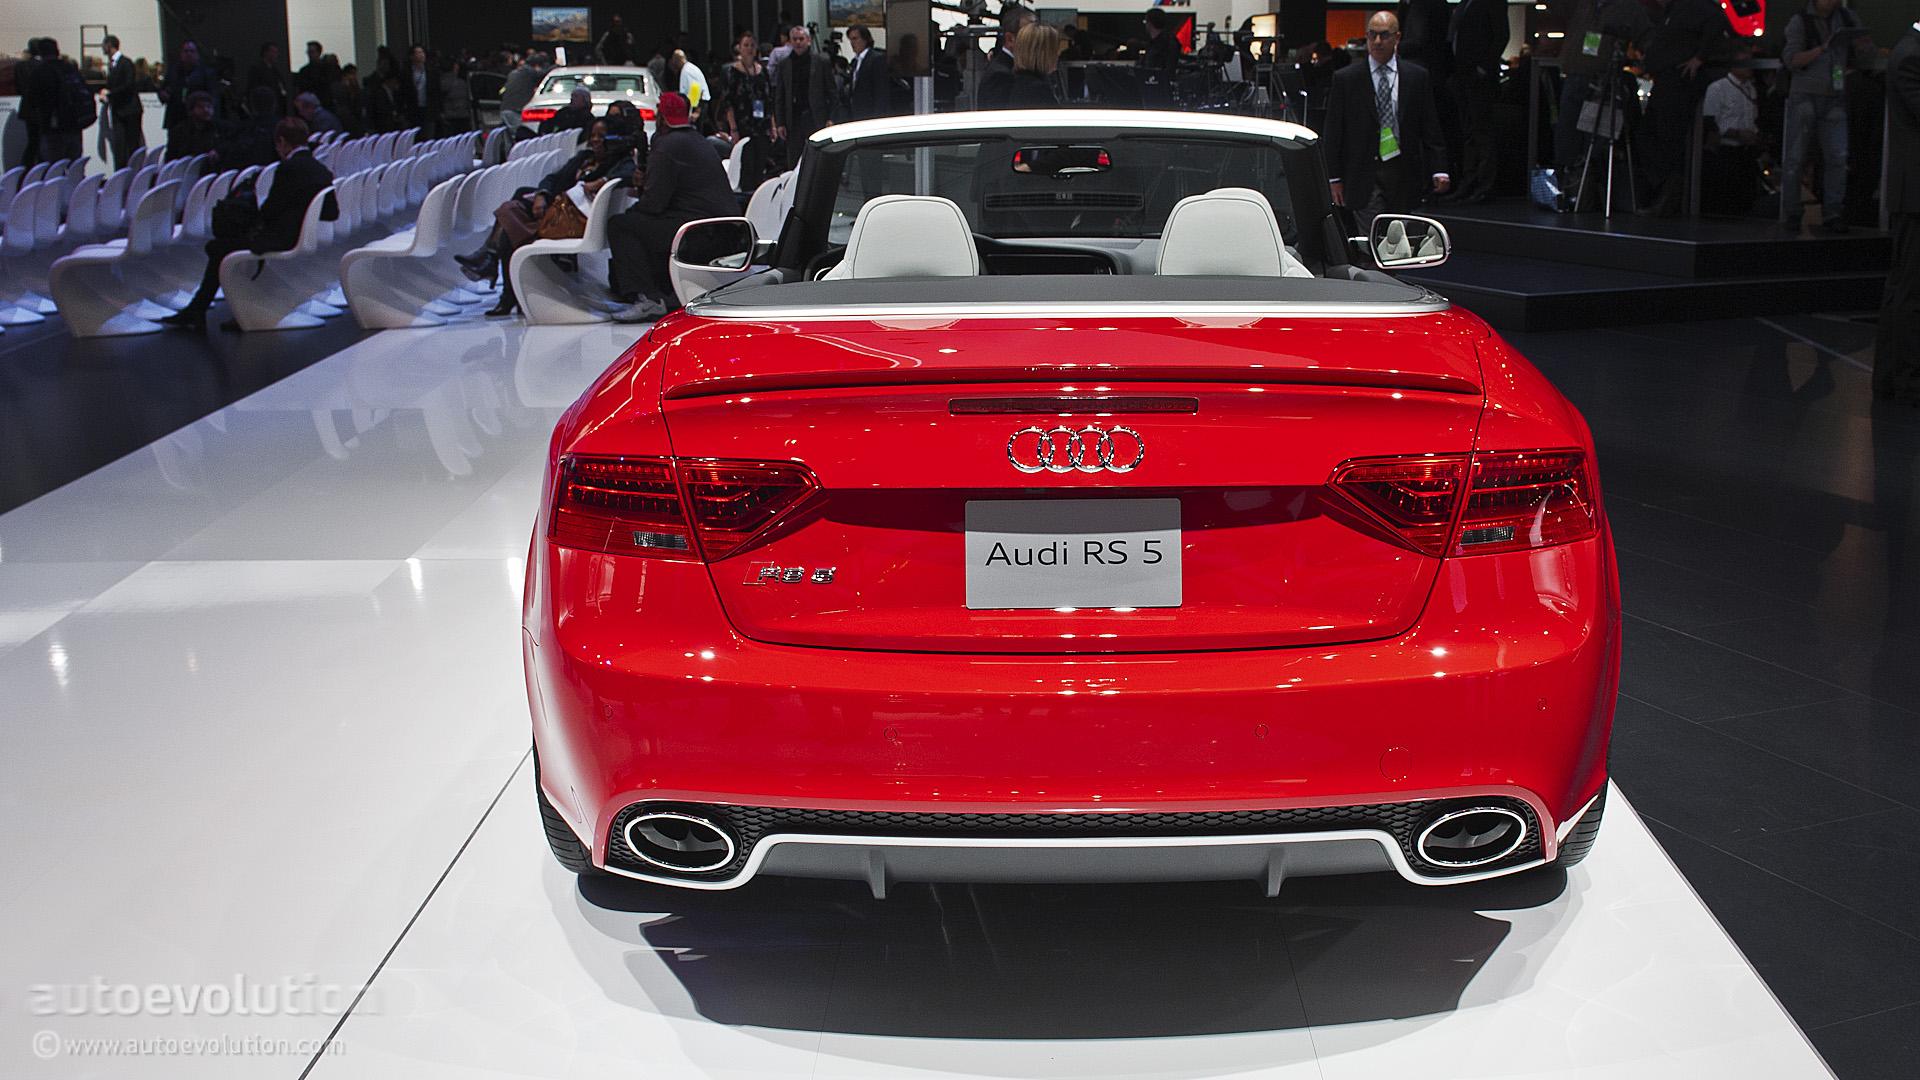 2013 NAIAS: Audi RS5 Cabriolet [Live Photos] - autoevolution